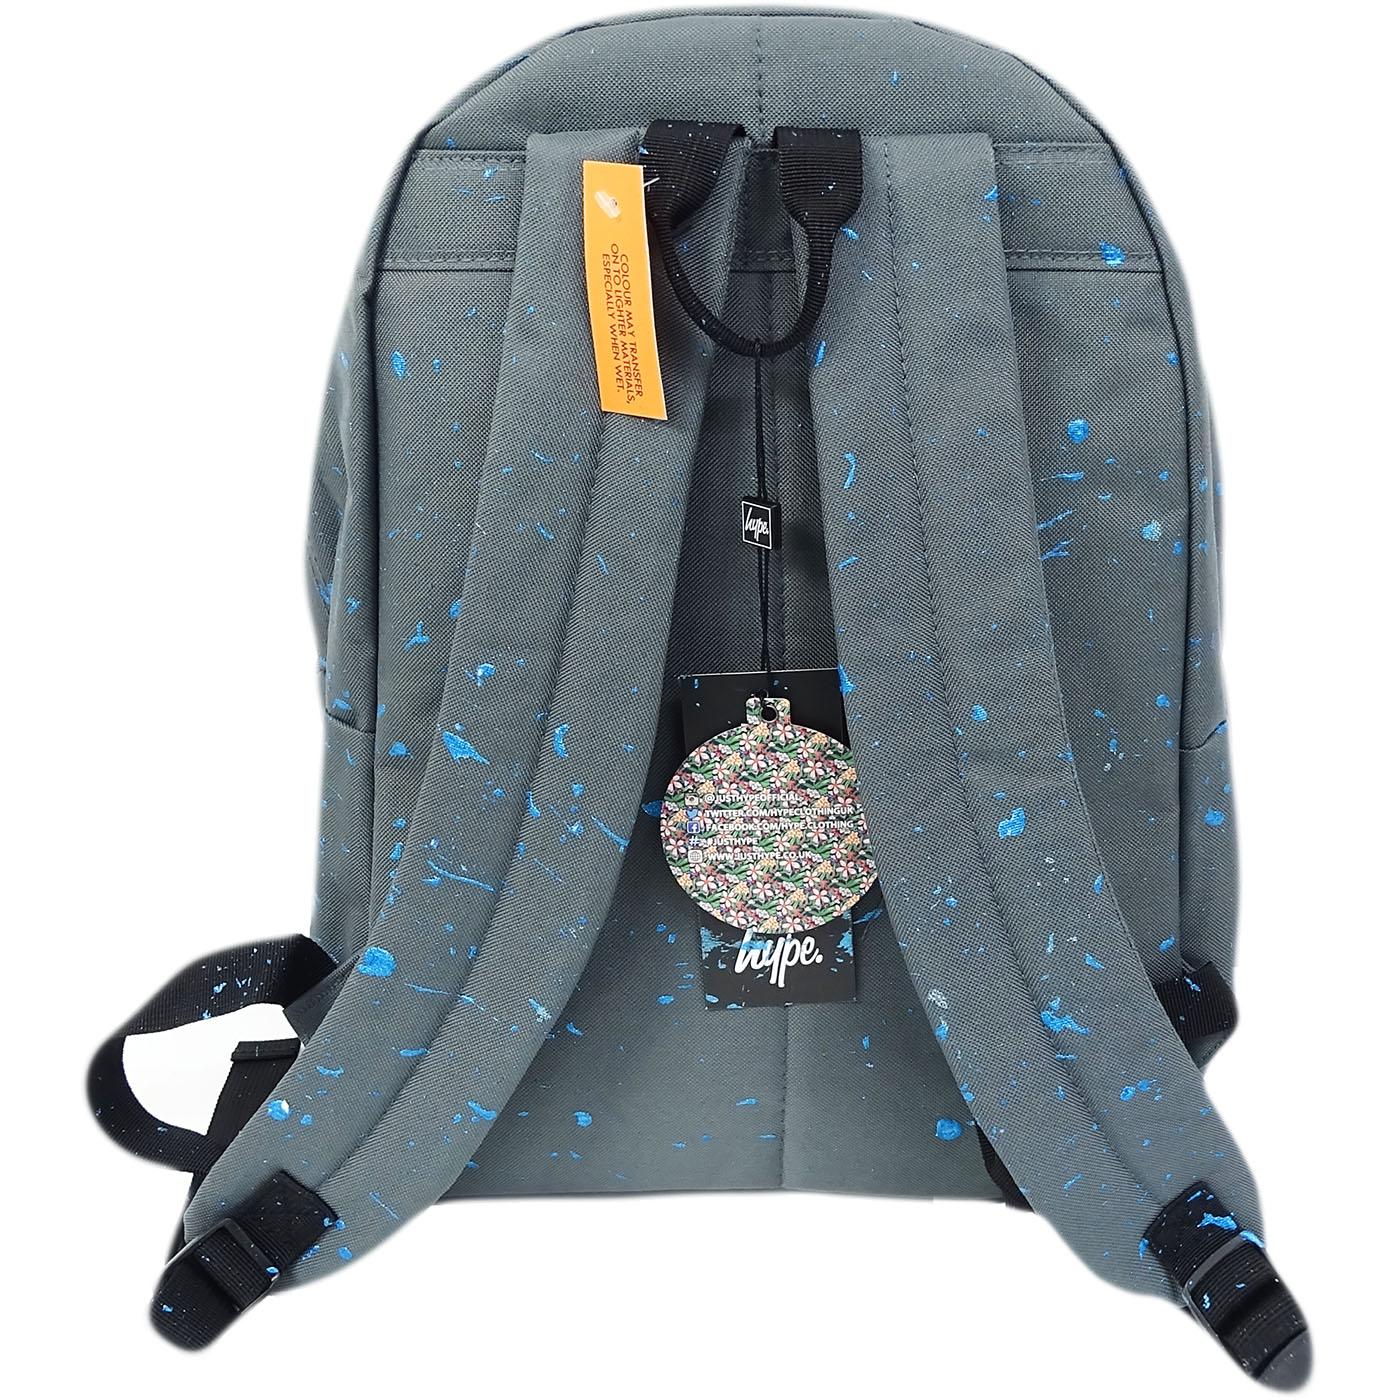 Unisexe-Hype-Sac-A-Dos-Ecole-Gym-SACS-pochettes-pencil-case miniature 141